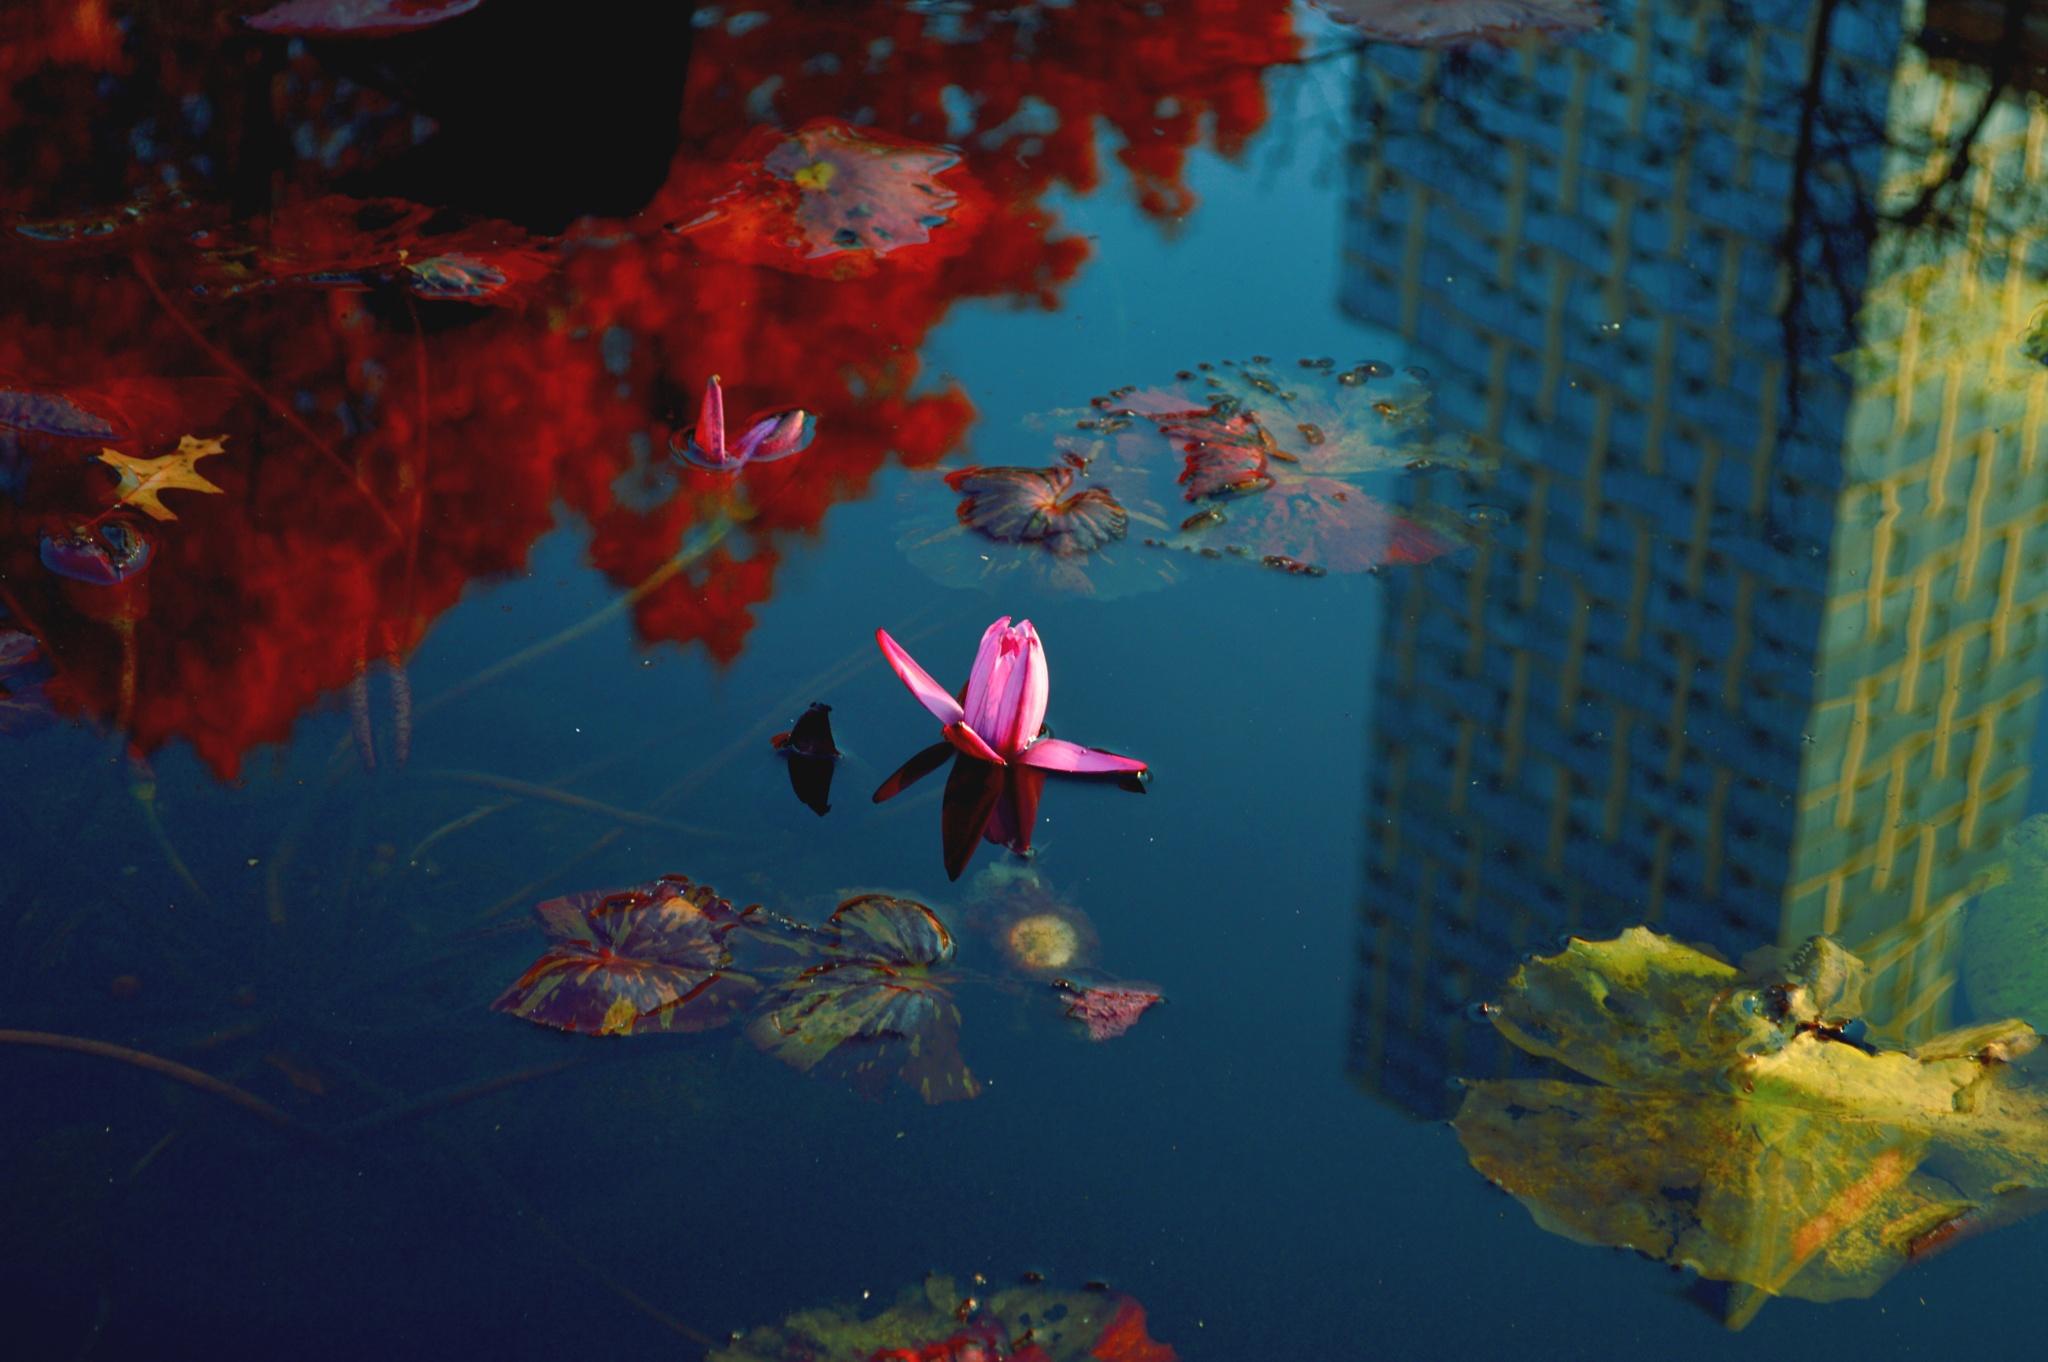 Ah..autumn reflection by Yoko D